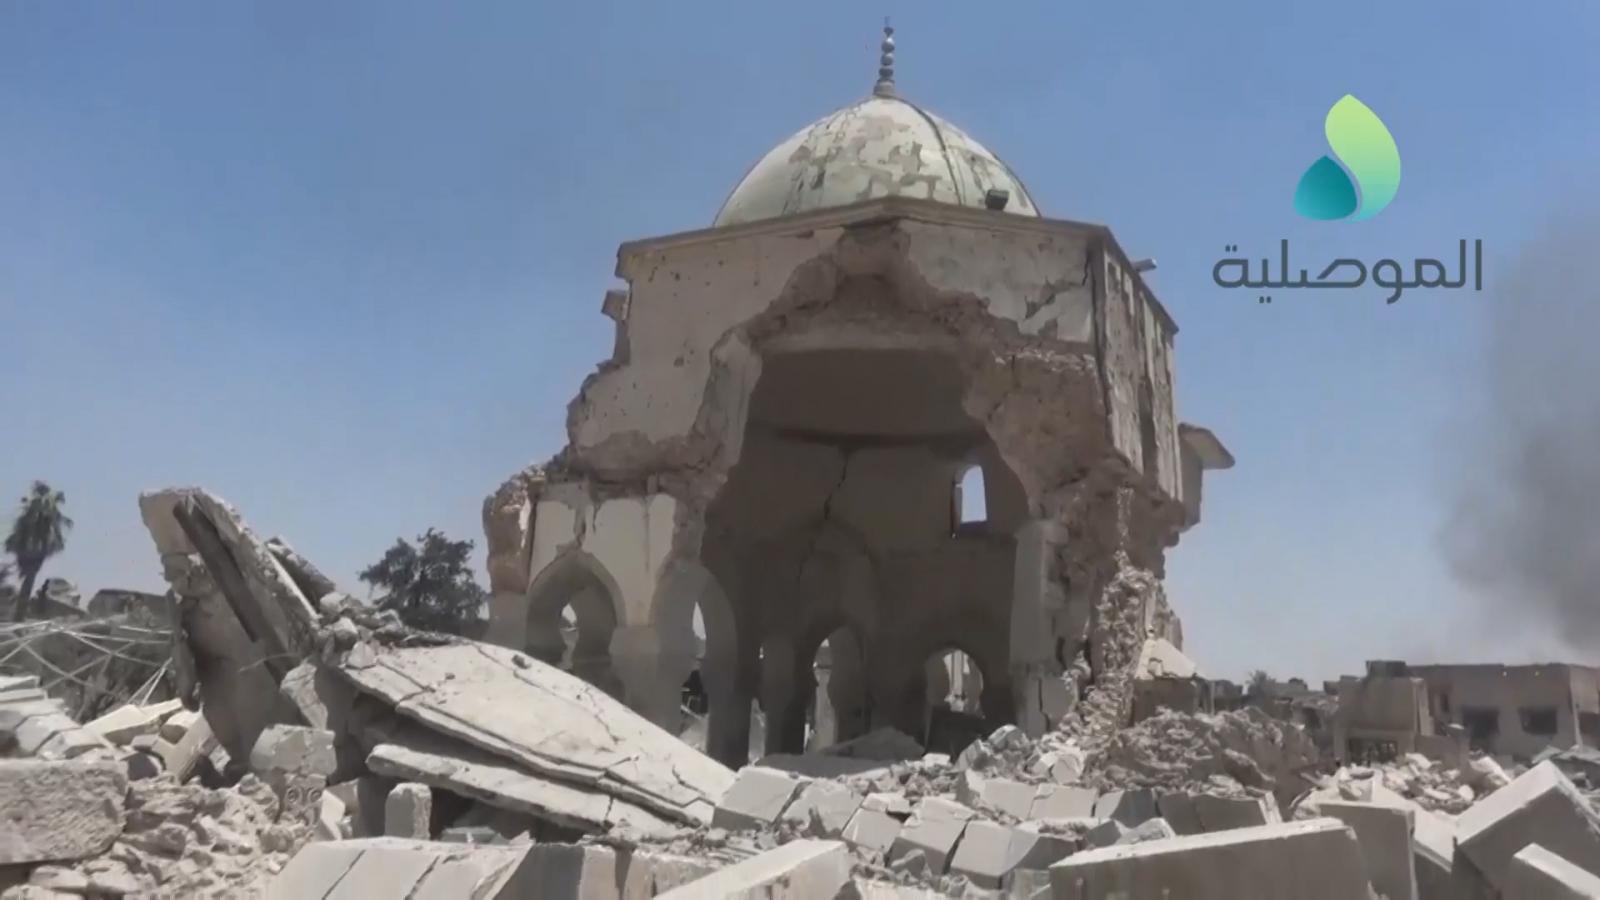 Abu bakr al baghdadi - 2 part 4